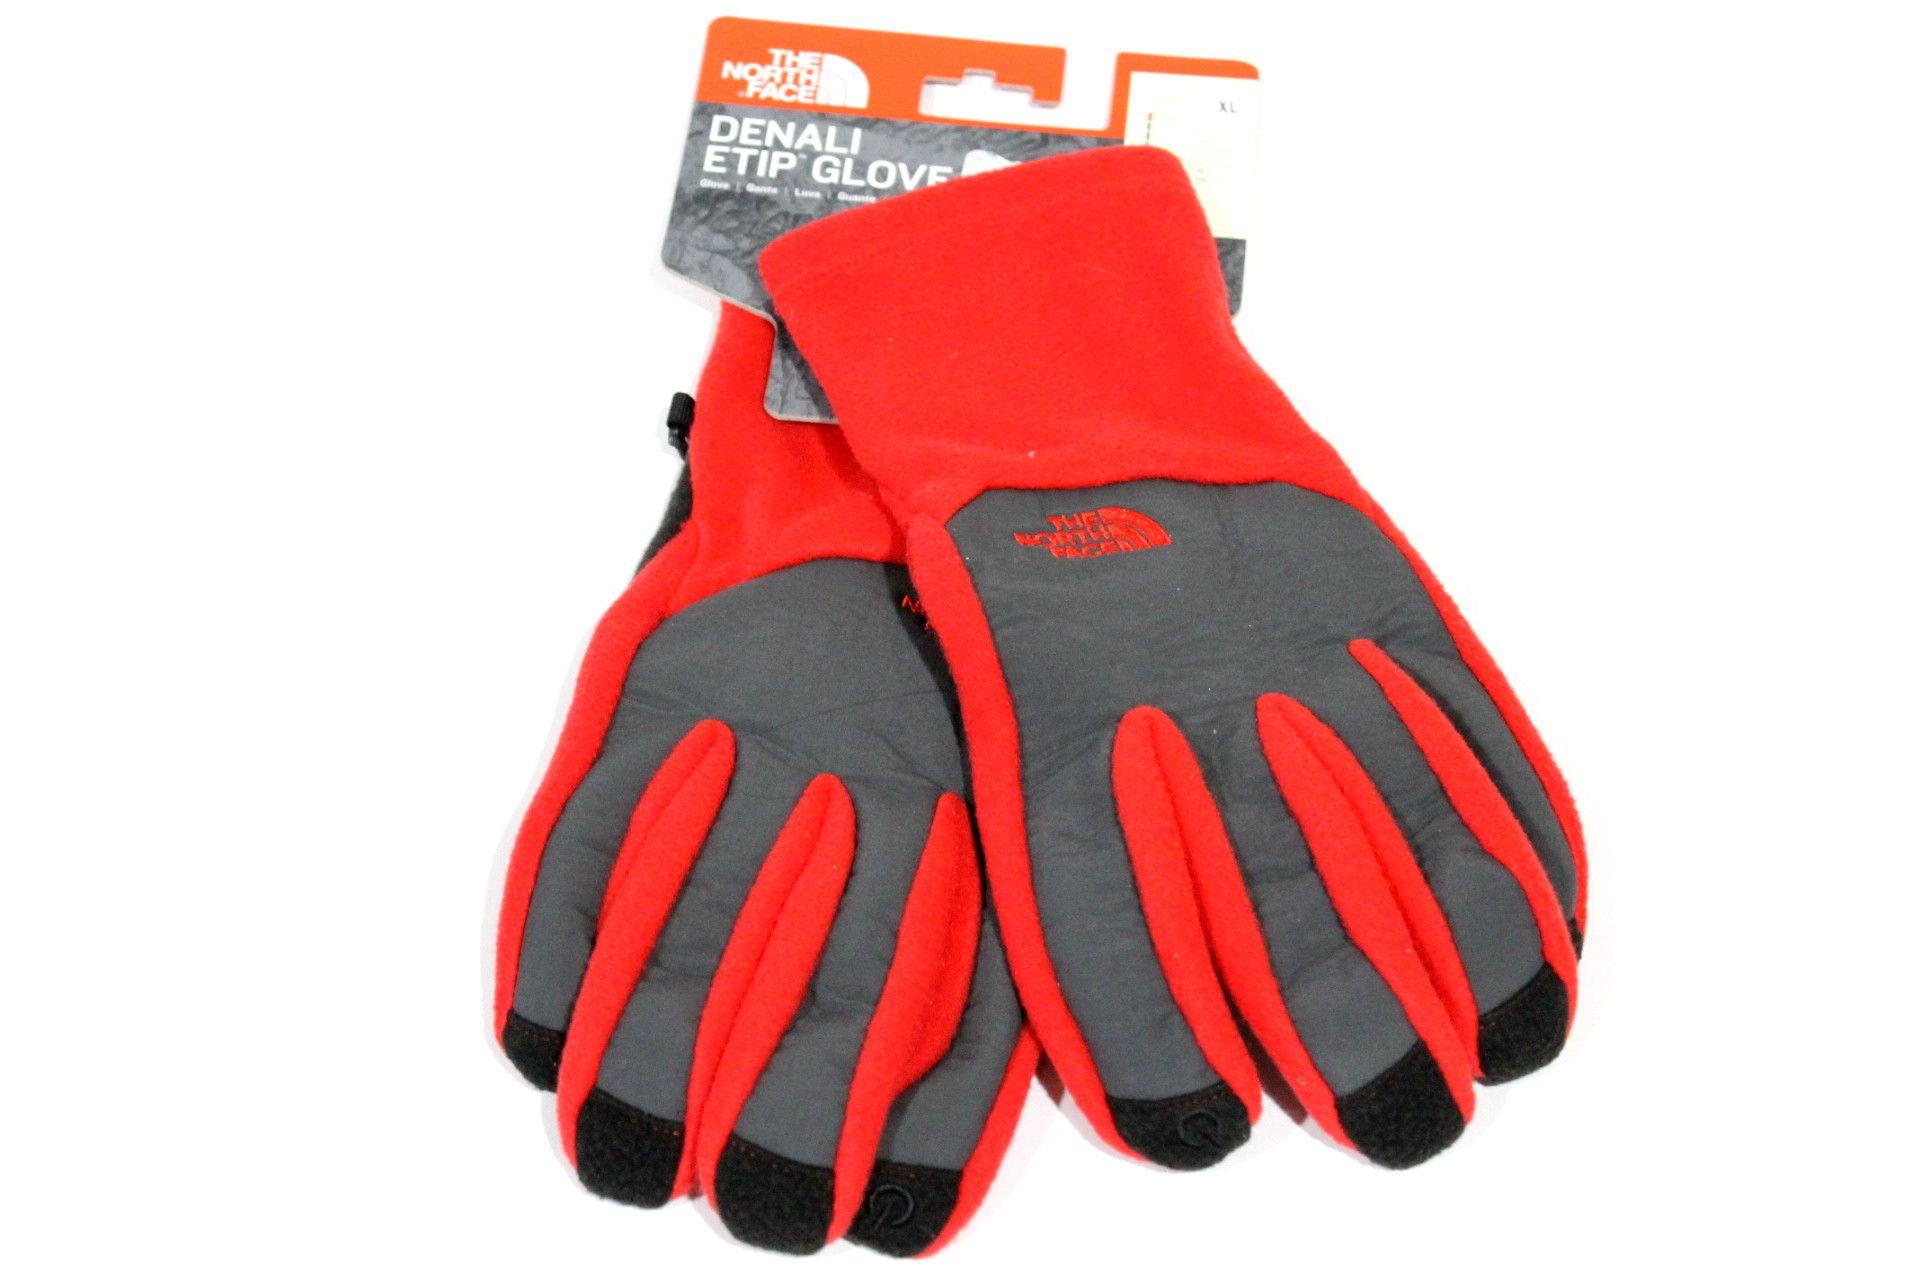 The North Face Men's Denali Etip Gloves TNF Red for just $23.99  #nikesoccer #nikerunning #soccercleats #shox… #shox #teamsport #Men39 #beaniehat #cleats… #niketech